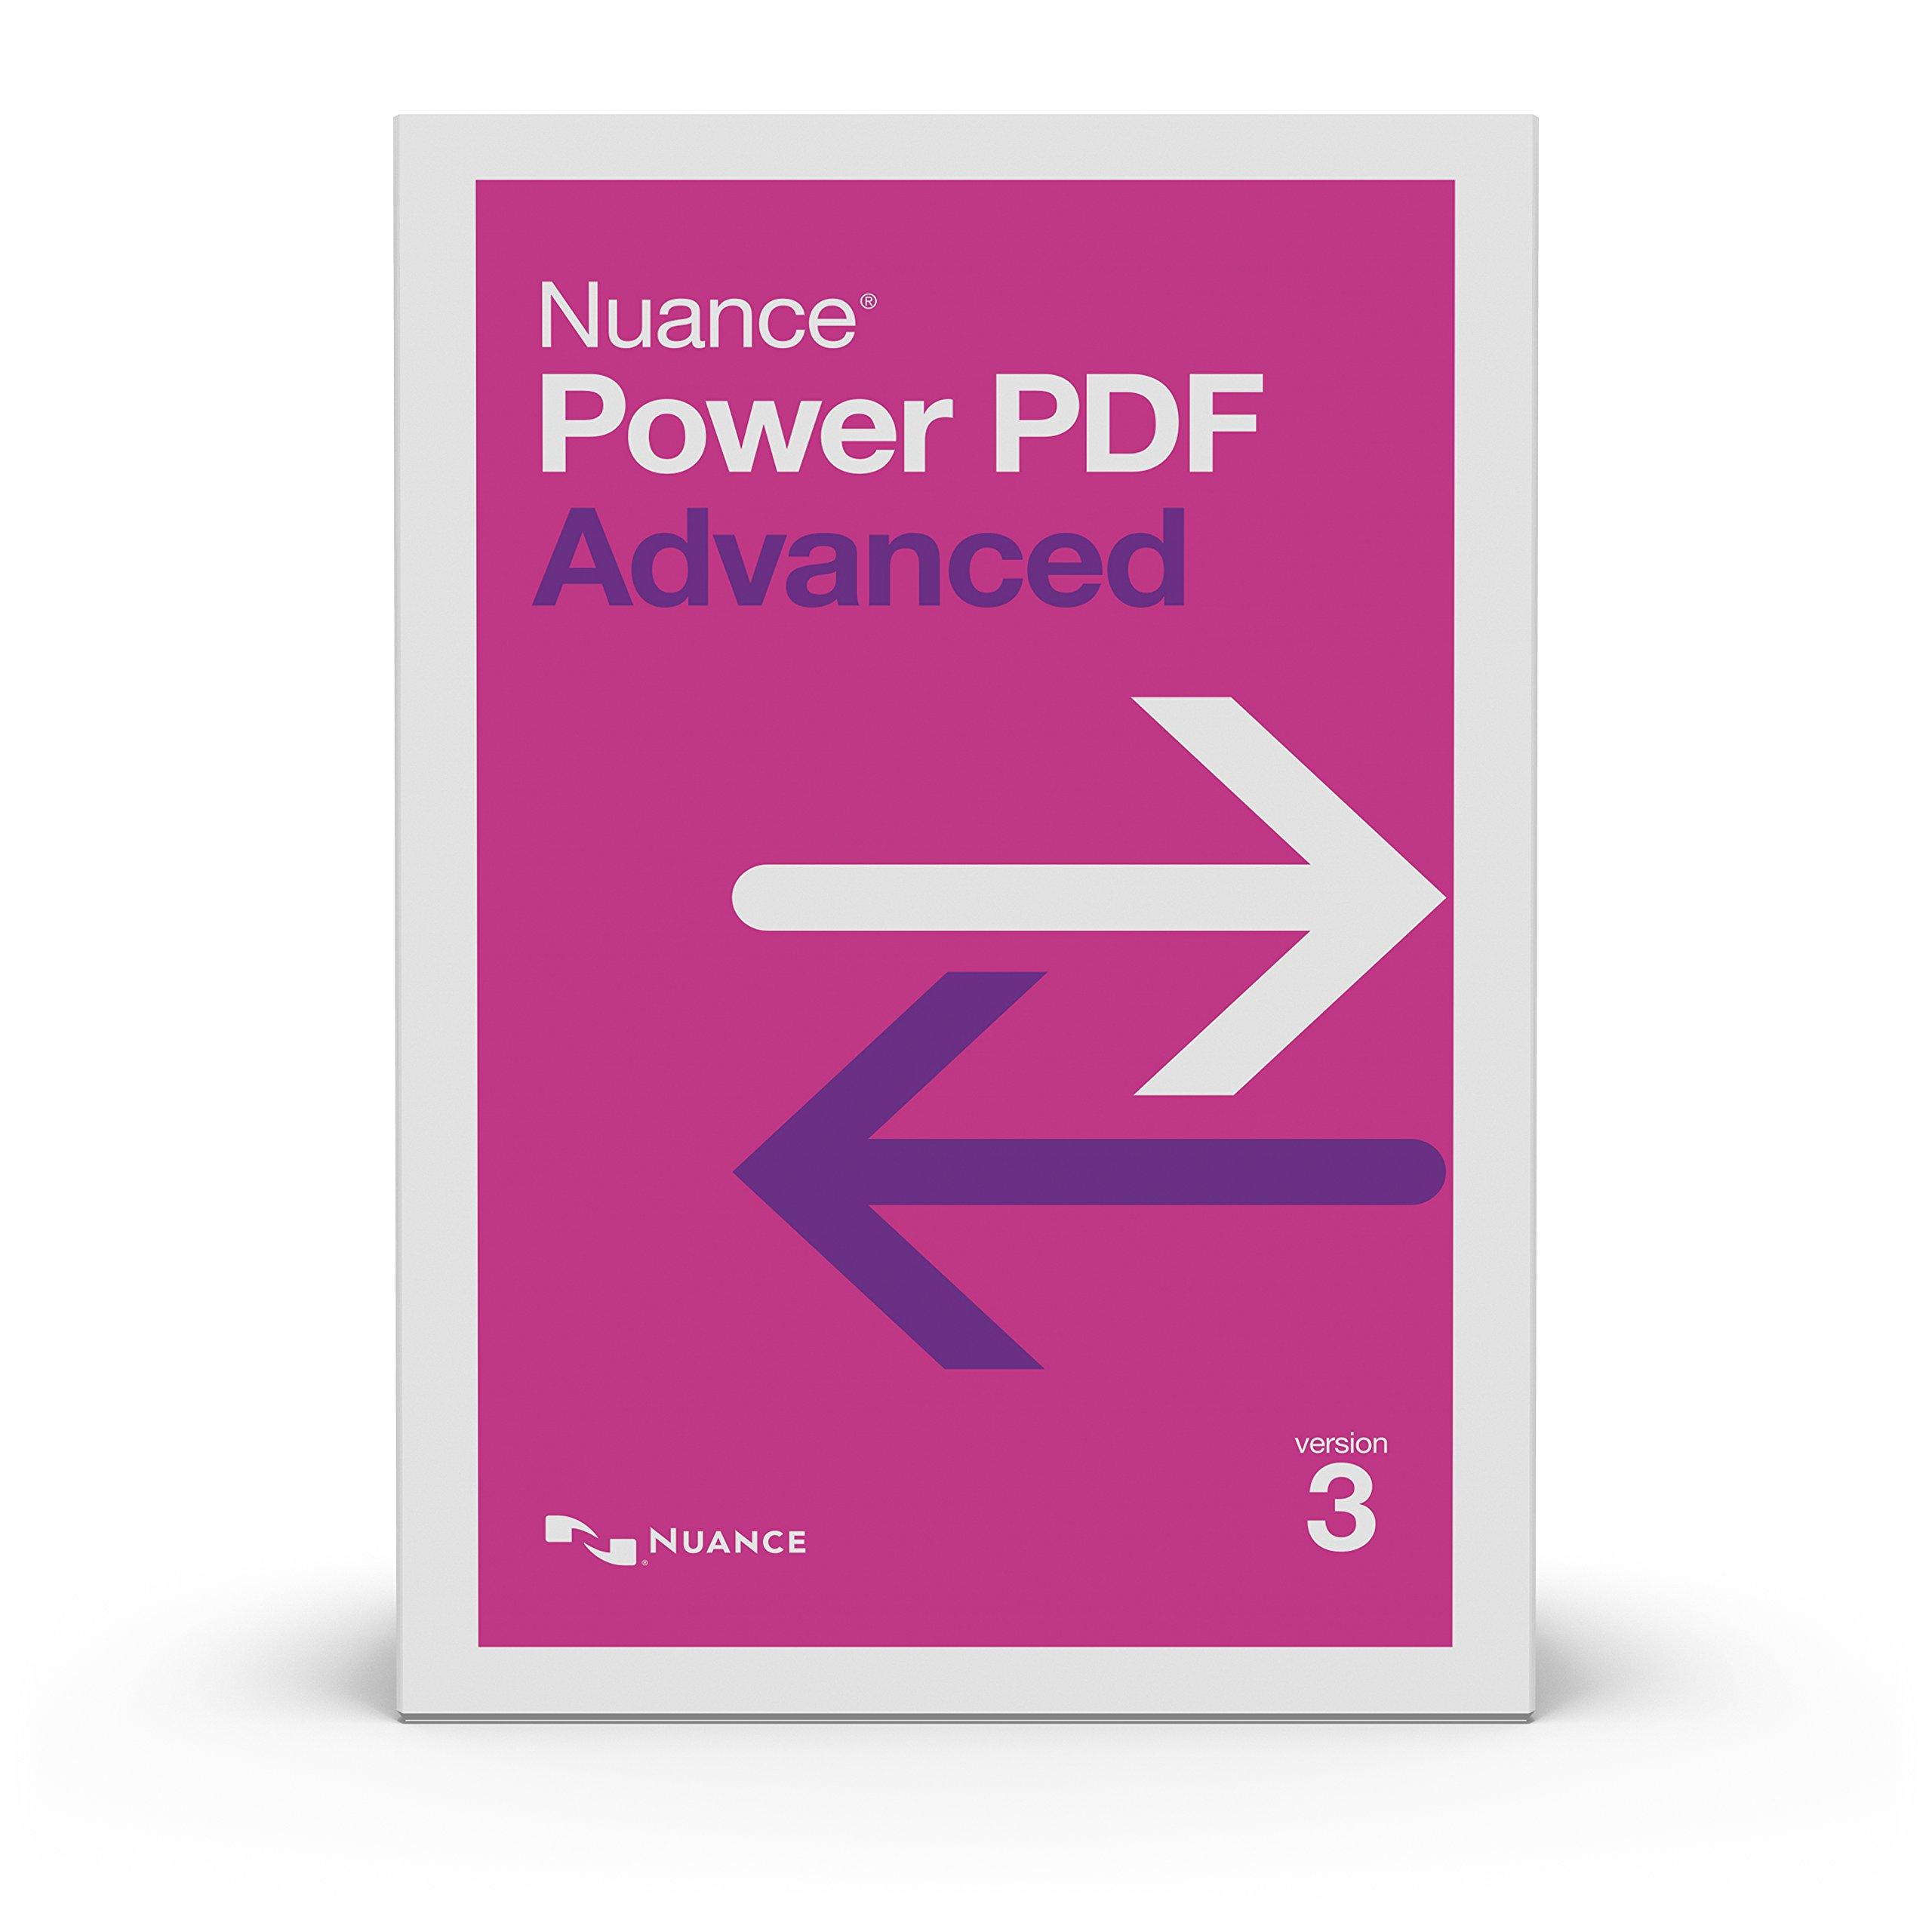 Kofax Power PDF Advanced 3.0 [PC Download] by Kofax Power PDF